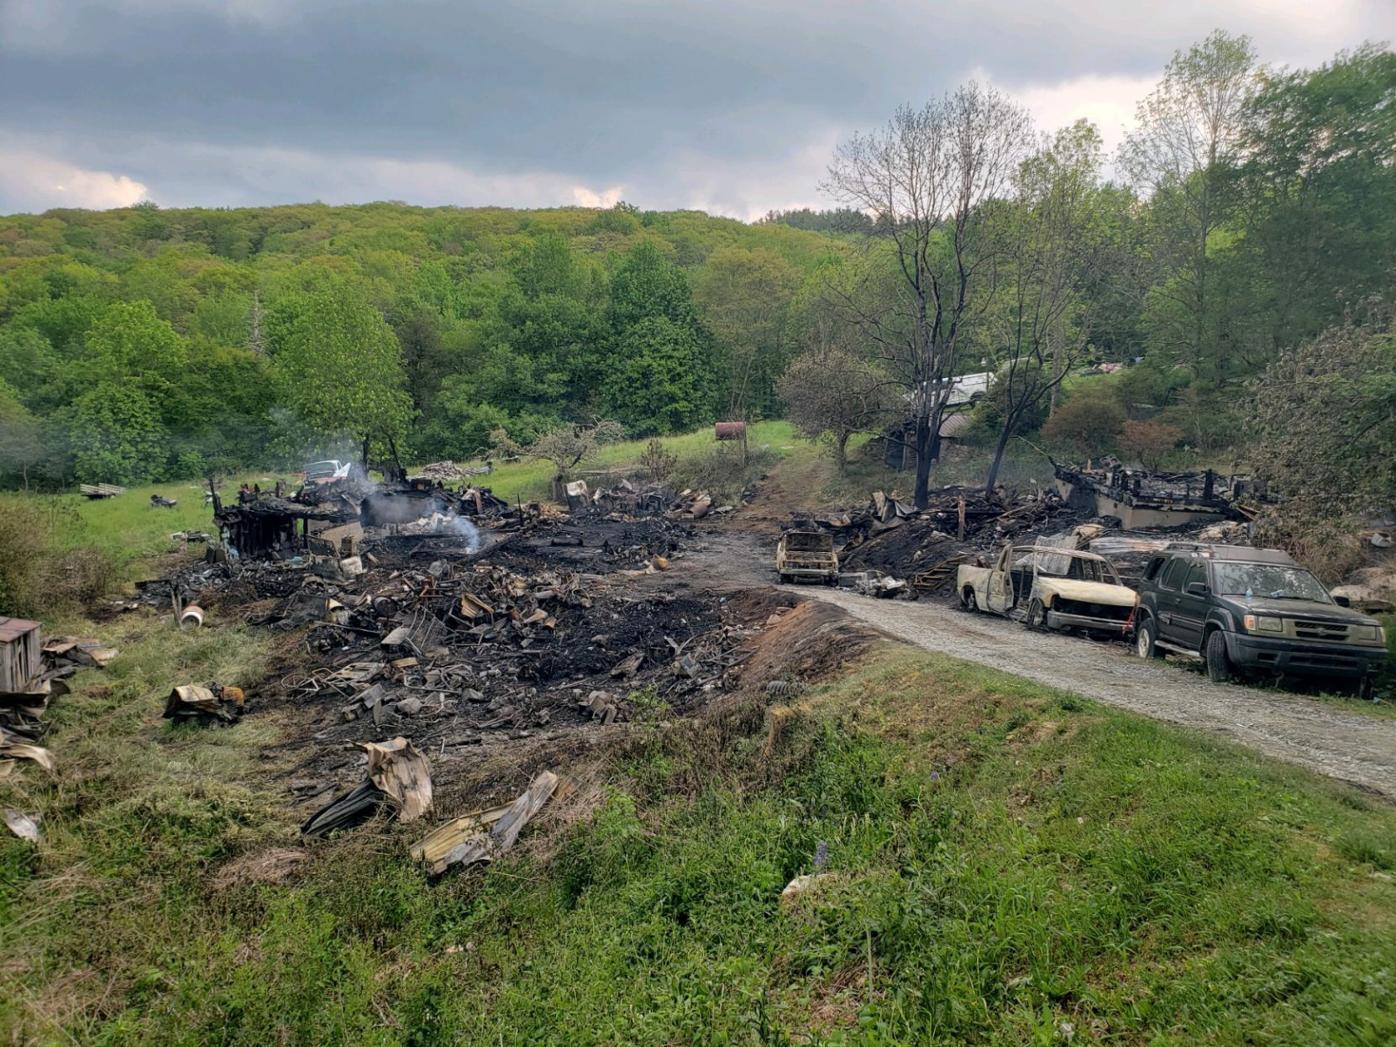 218 Old Mountain Road fire near Beech Mountain